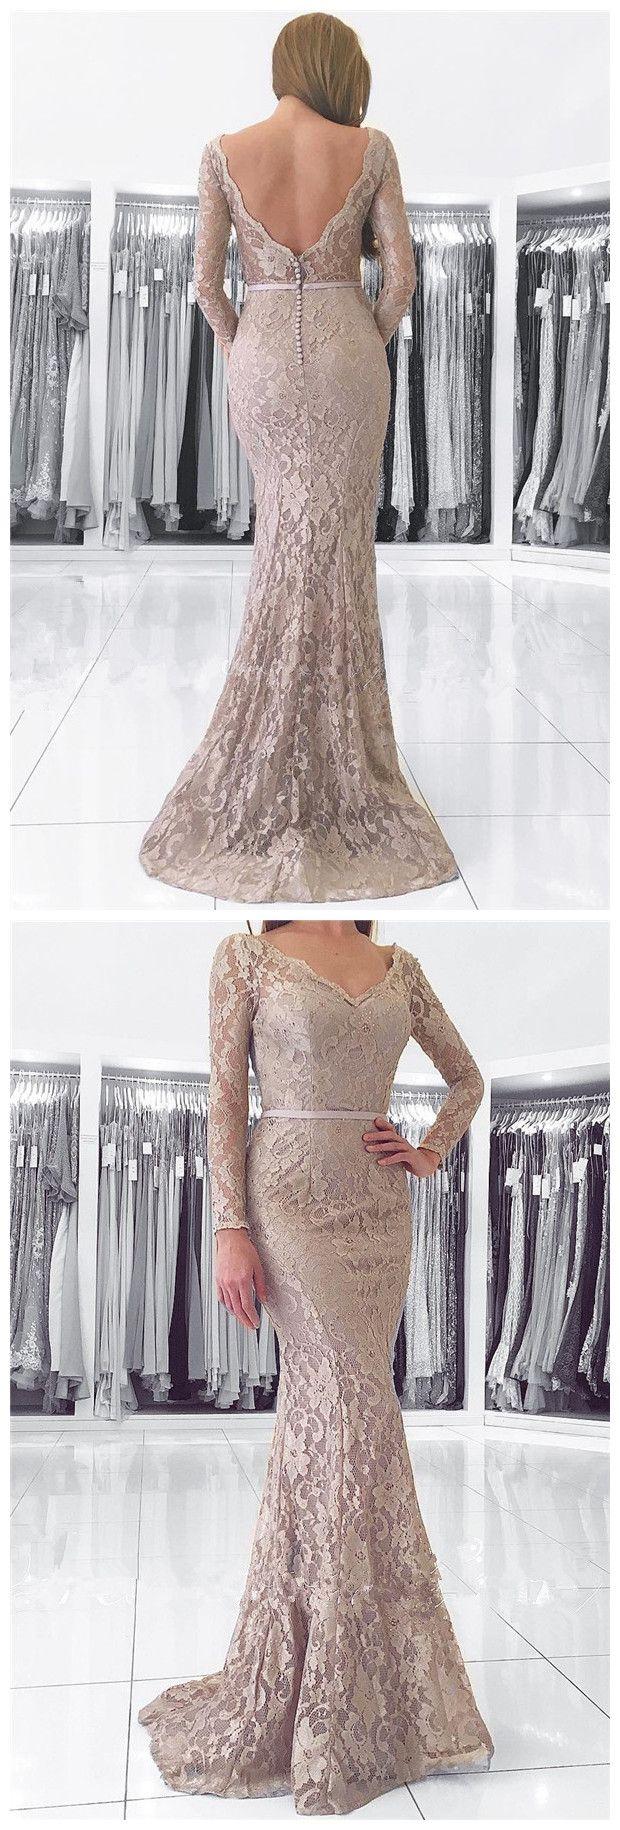 Prom dresslace prom dressesmermaid prom dresseslong prom dress